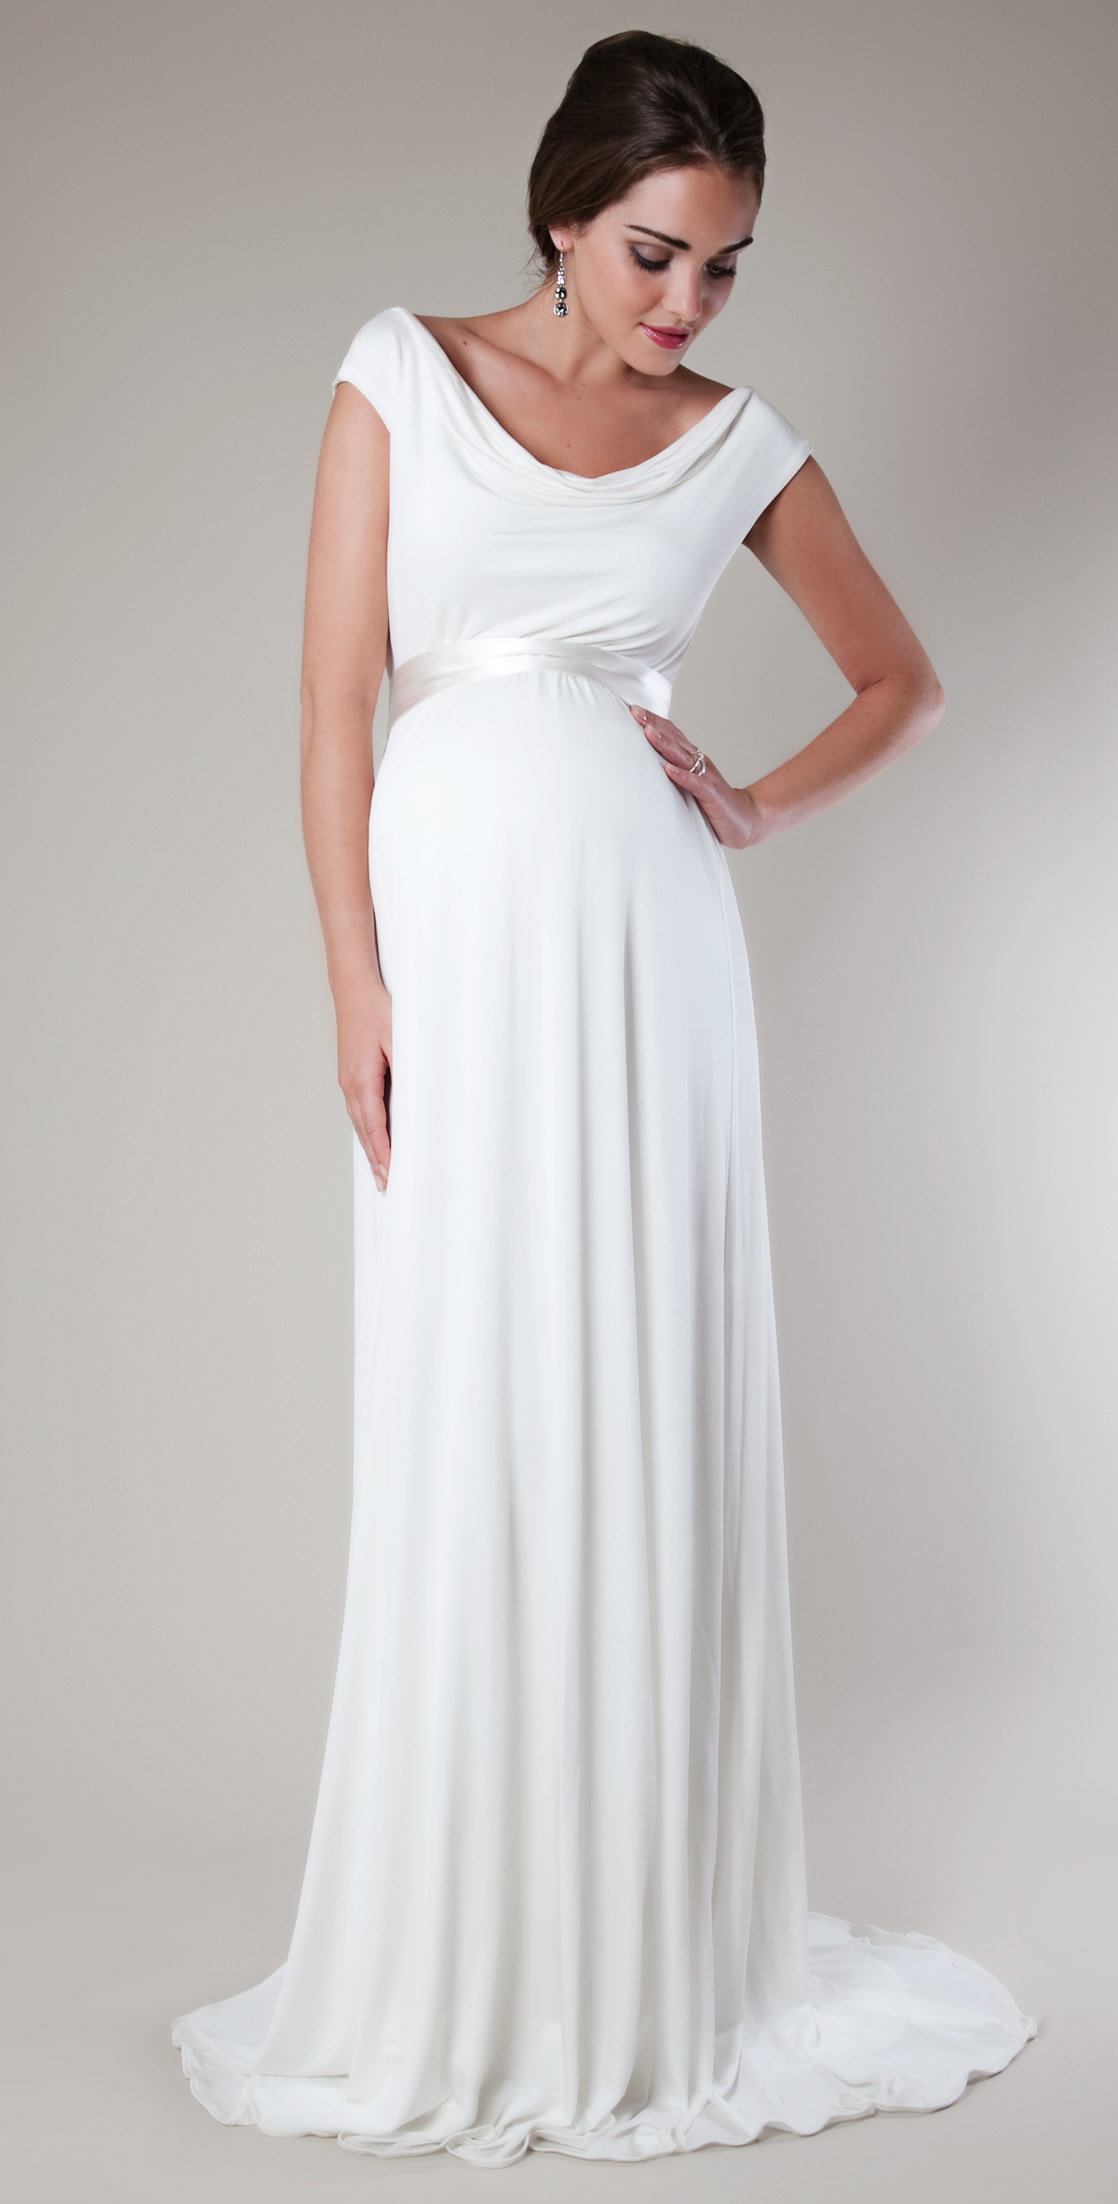 610bb69b4 vestido de novia premamá vestido novia embarazada vestido novia embarazada  ...